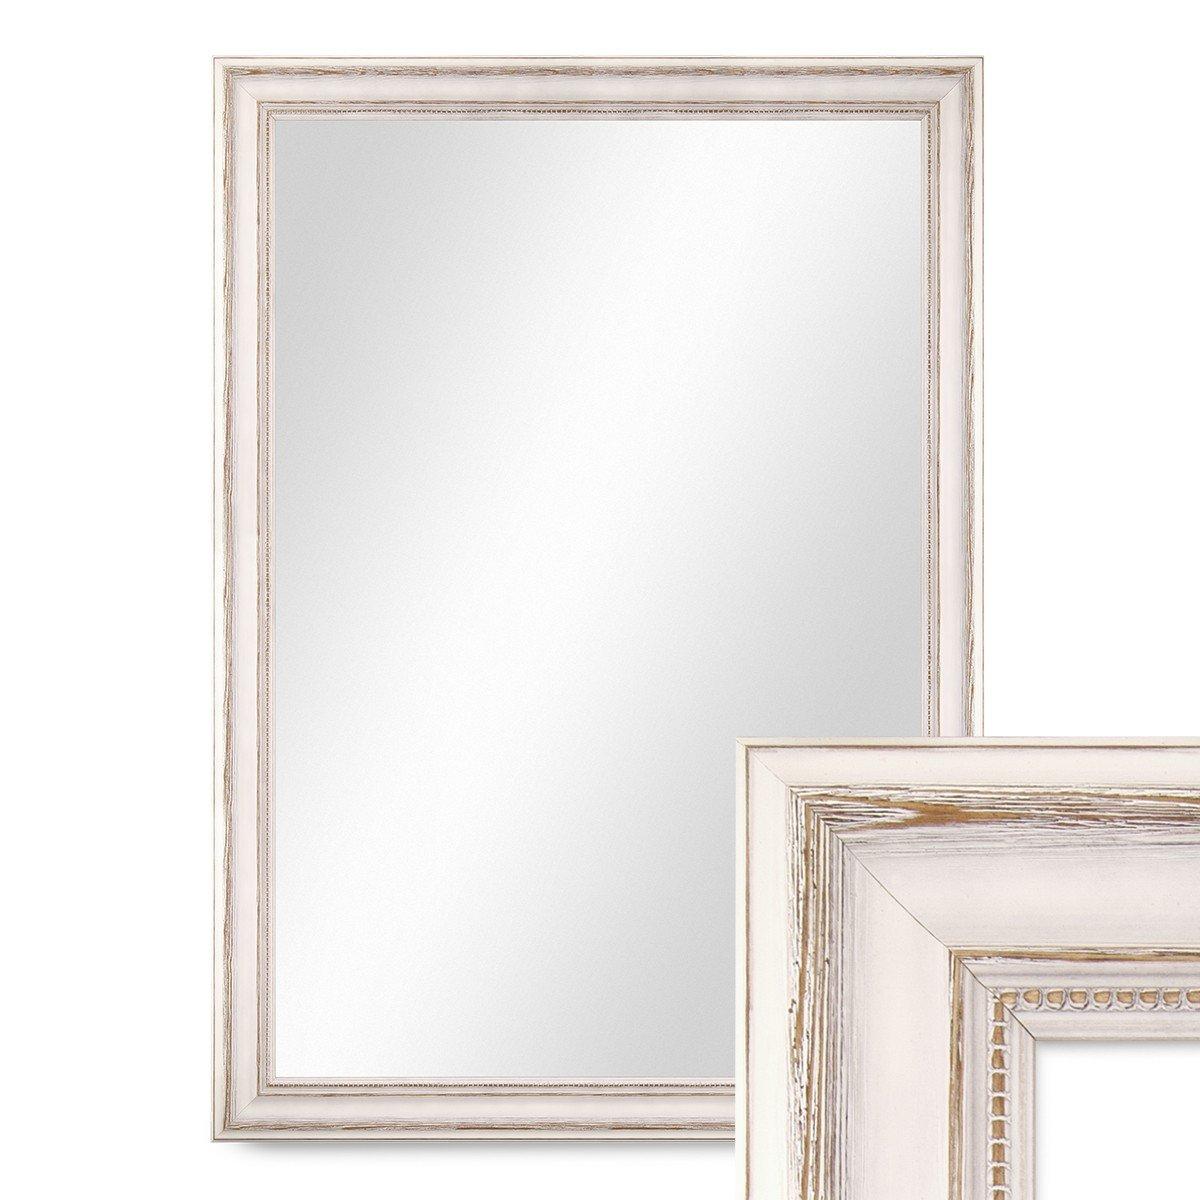 Photolini Wand-Spiegel 70x90 cm im Massivholz-Rahmen Landhaus-Stil ...